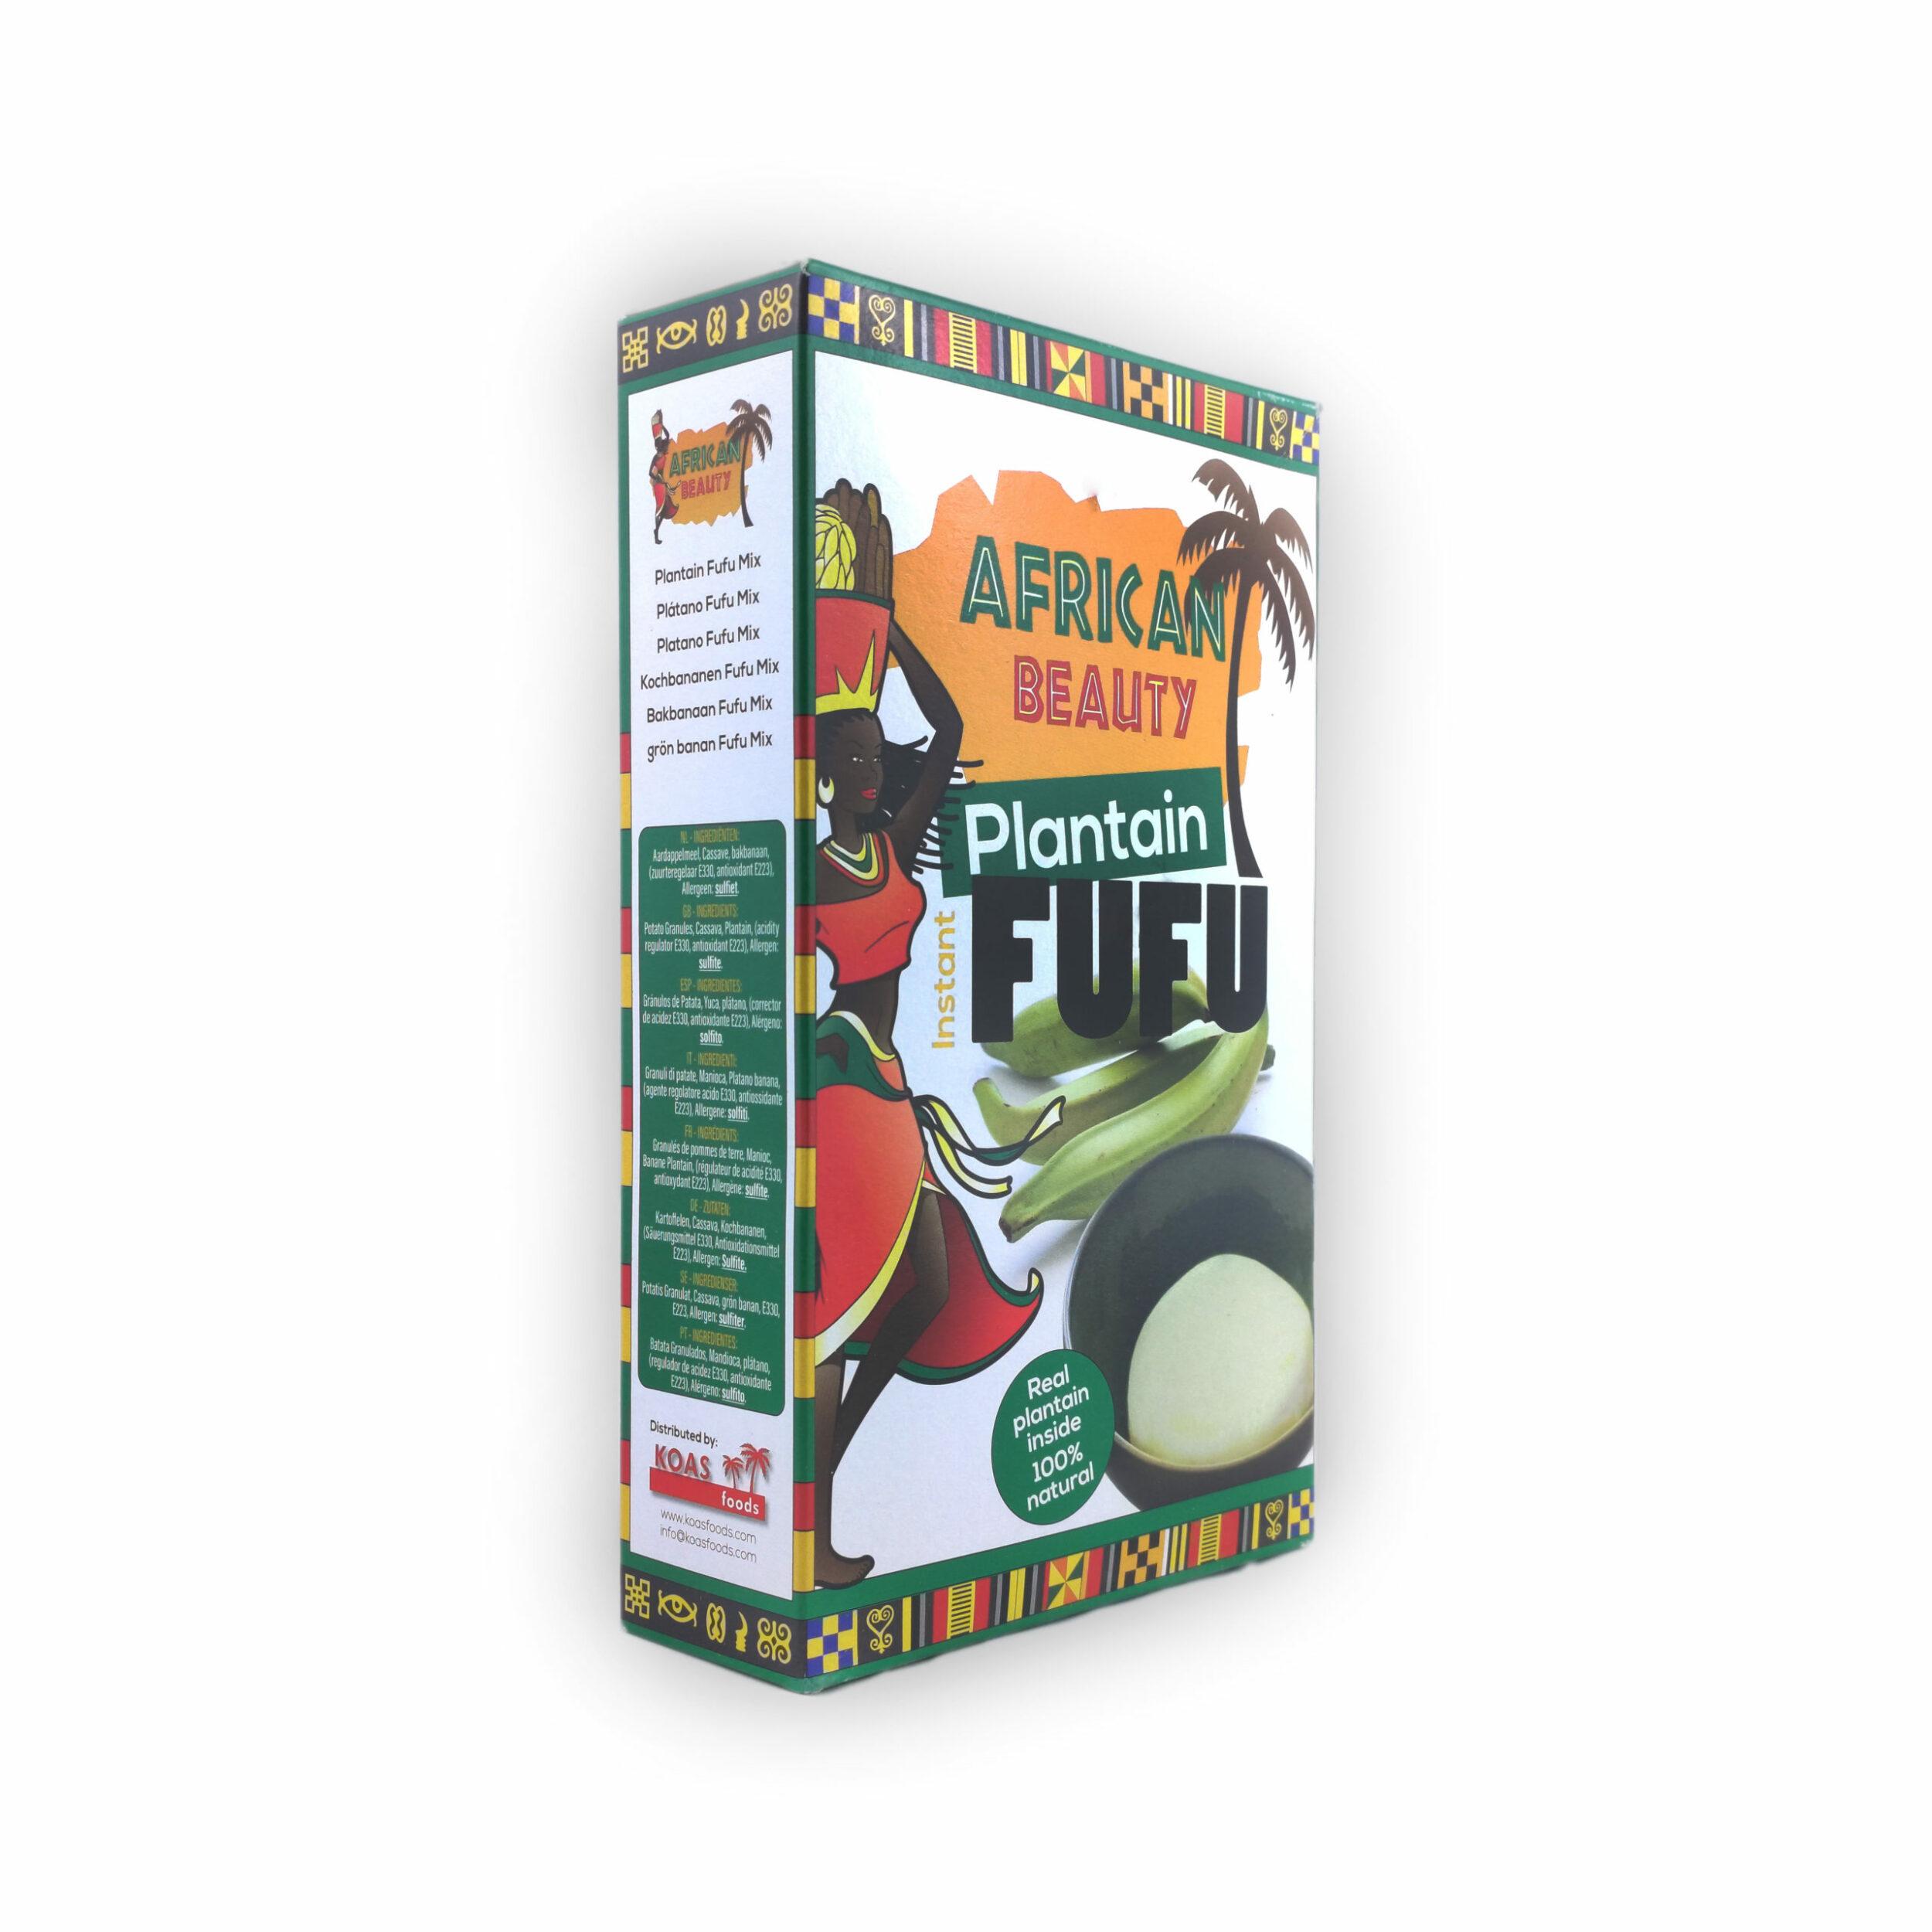 fufu-plantain-african-beauty-681g-3-site-web-moushenco